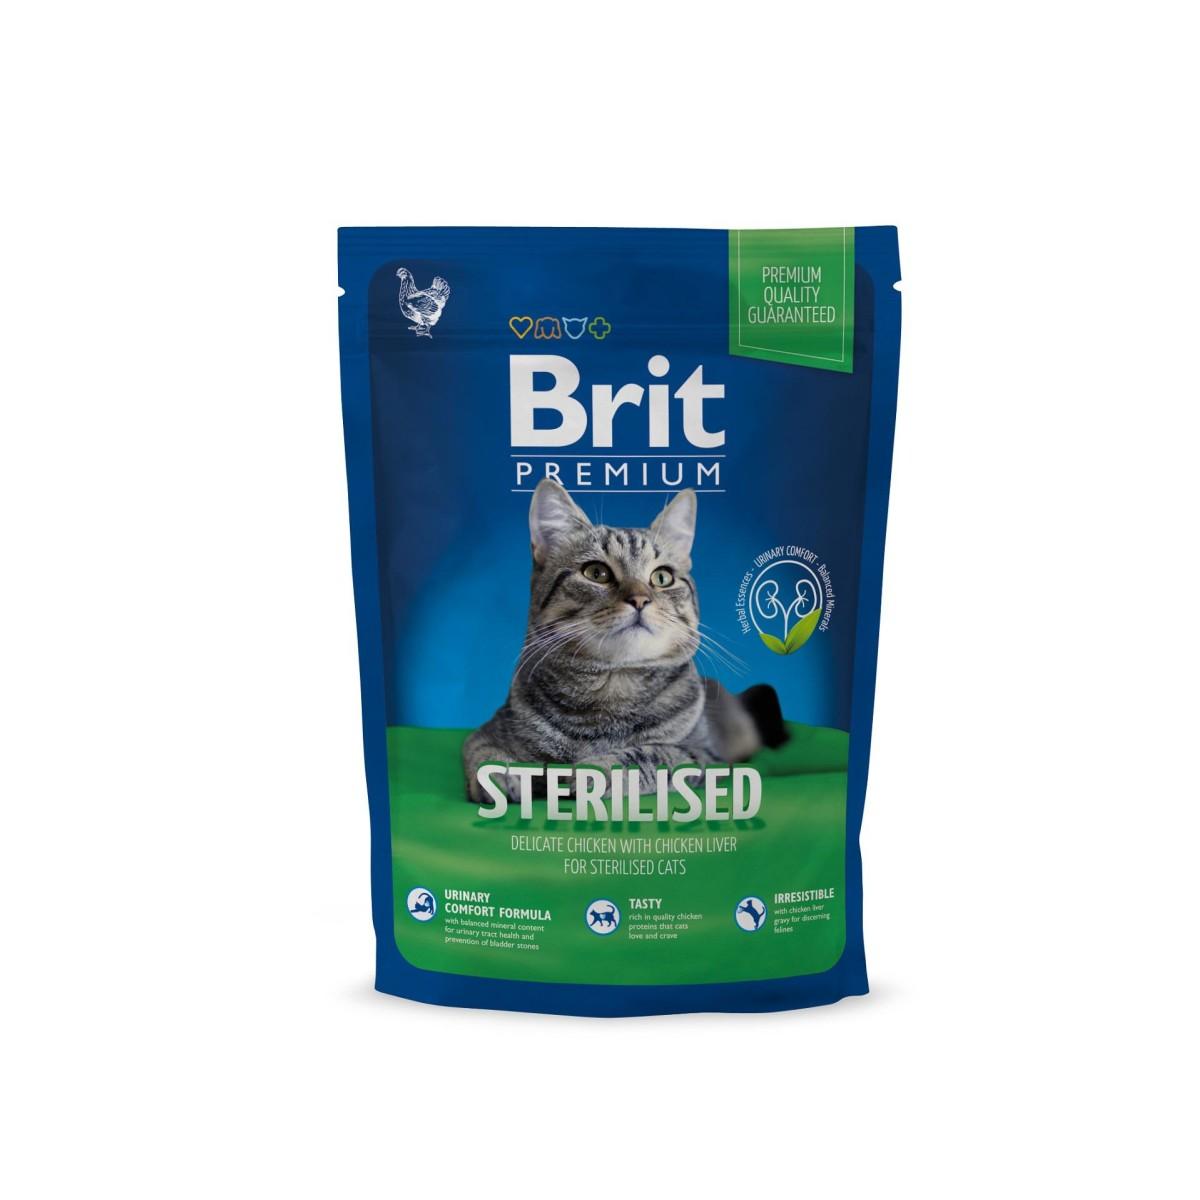 Сухой корм для кастрированных котов BRIT Premium Cat Sterilized Курица Печень 1.5 кг